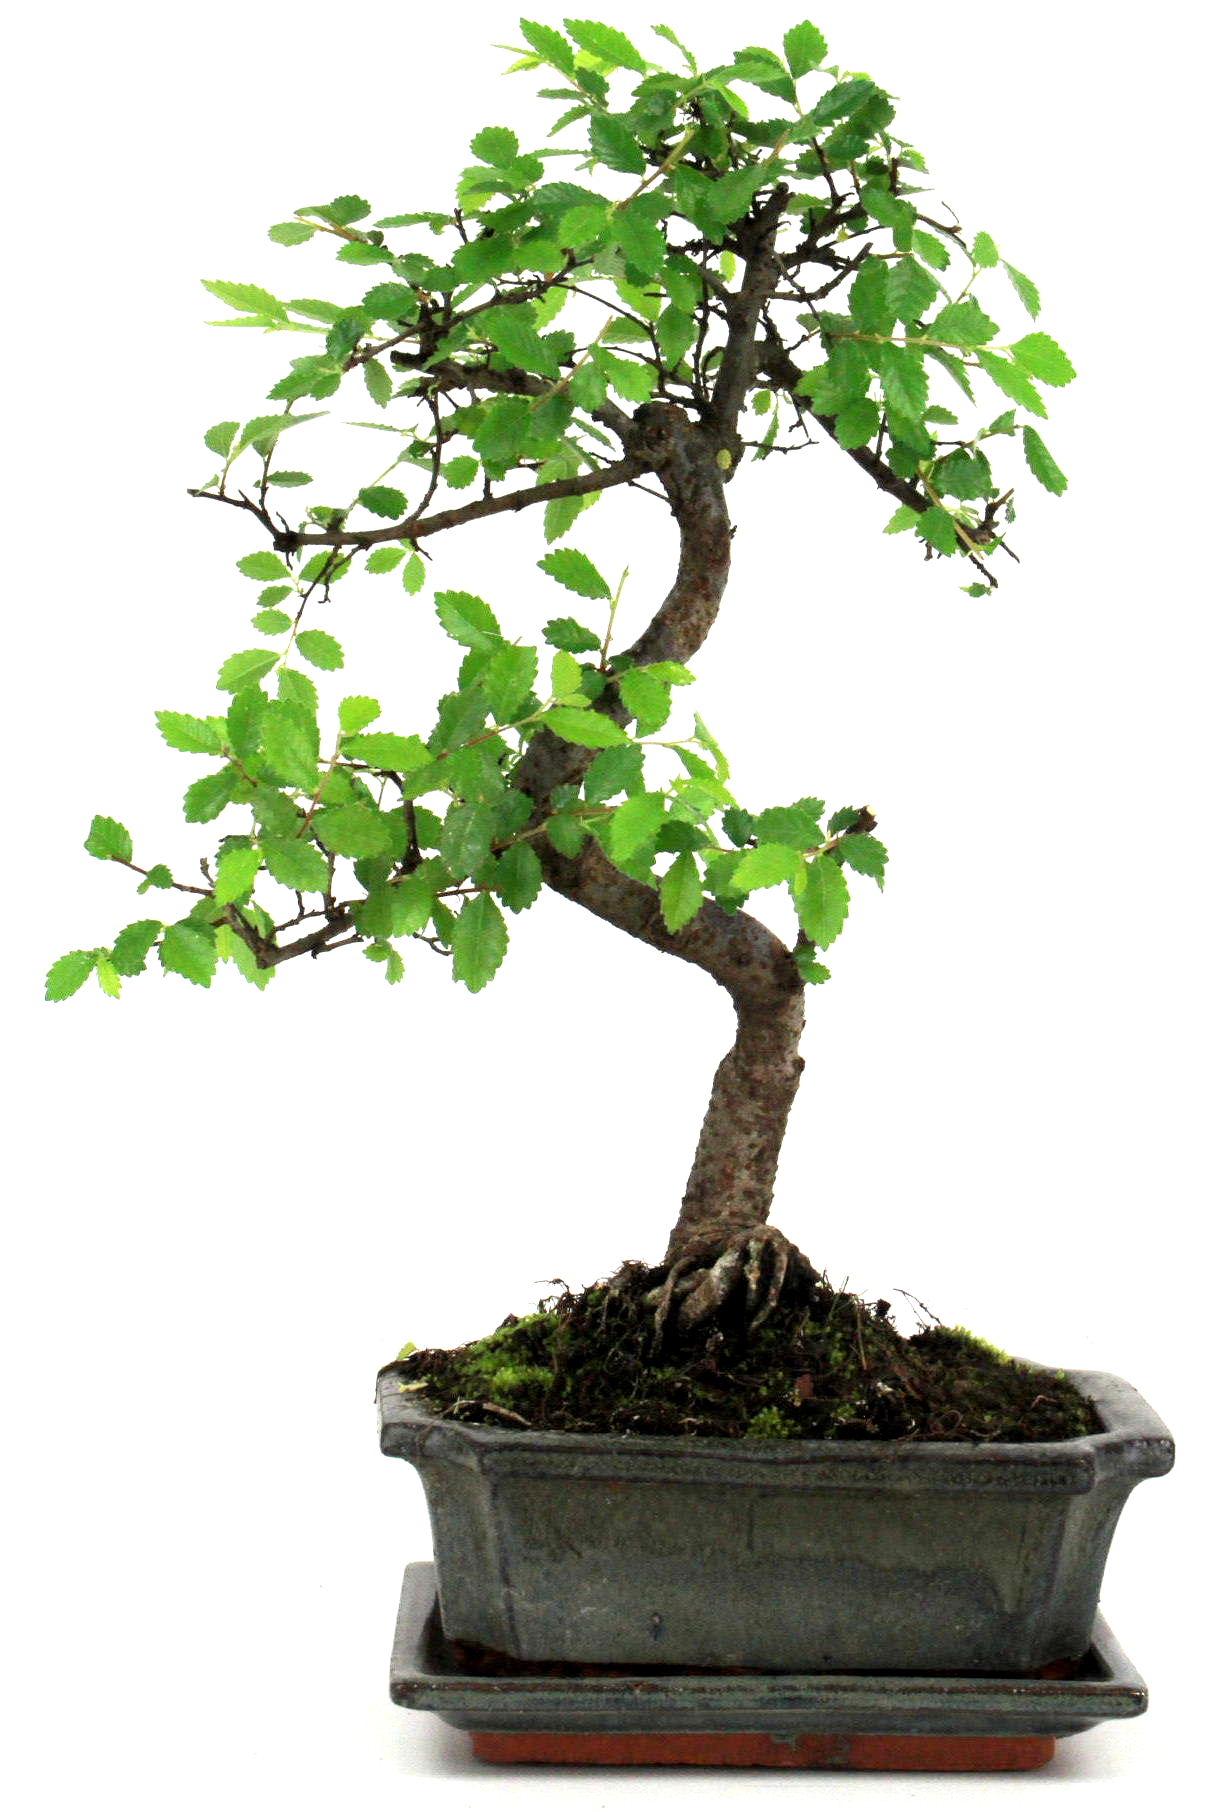 bonsai chinesische ulme 30 35 cm g1622 bei oyaki bonsai kaufen. Black Bedroom Furniture Sets. Home Design Ideas